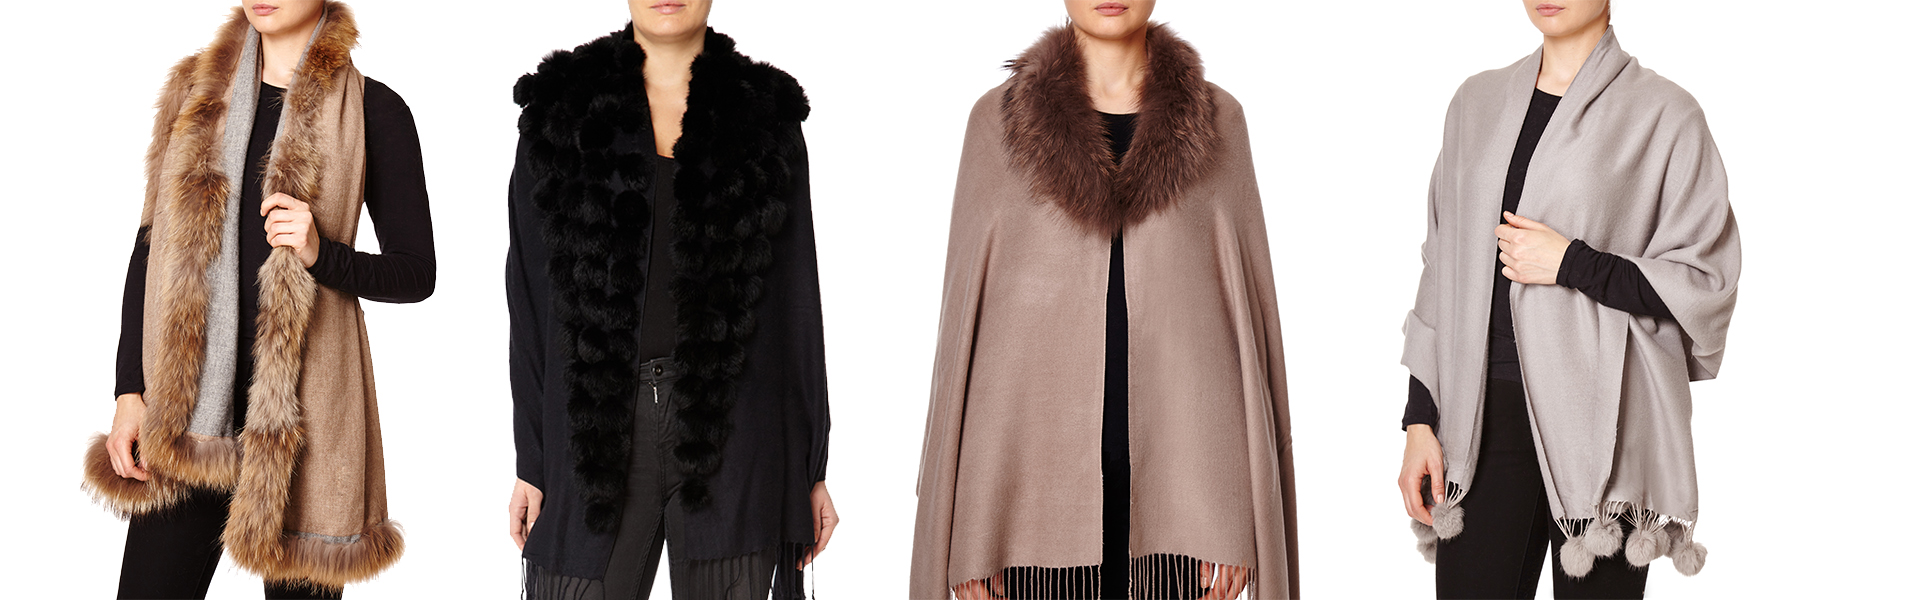 Cashmere & Fox Fur Wraps